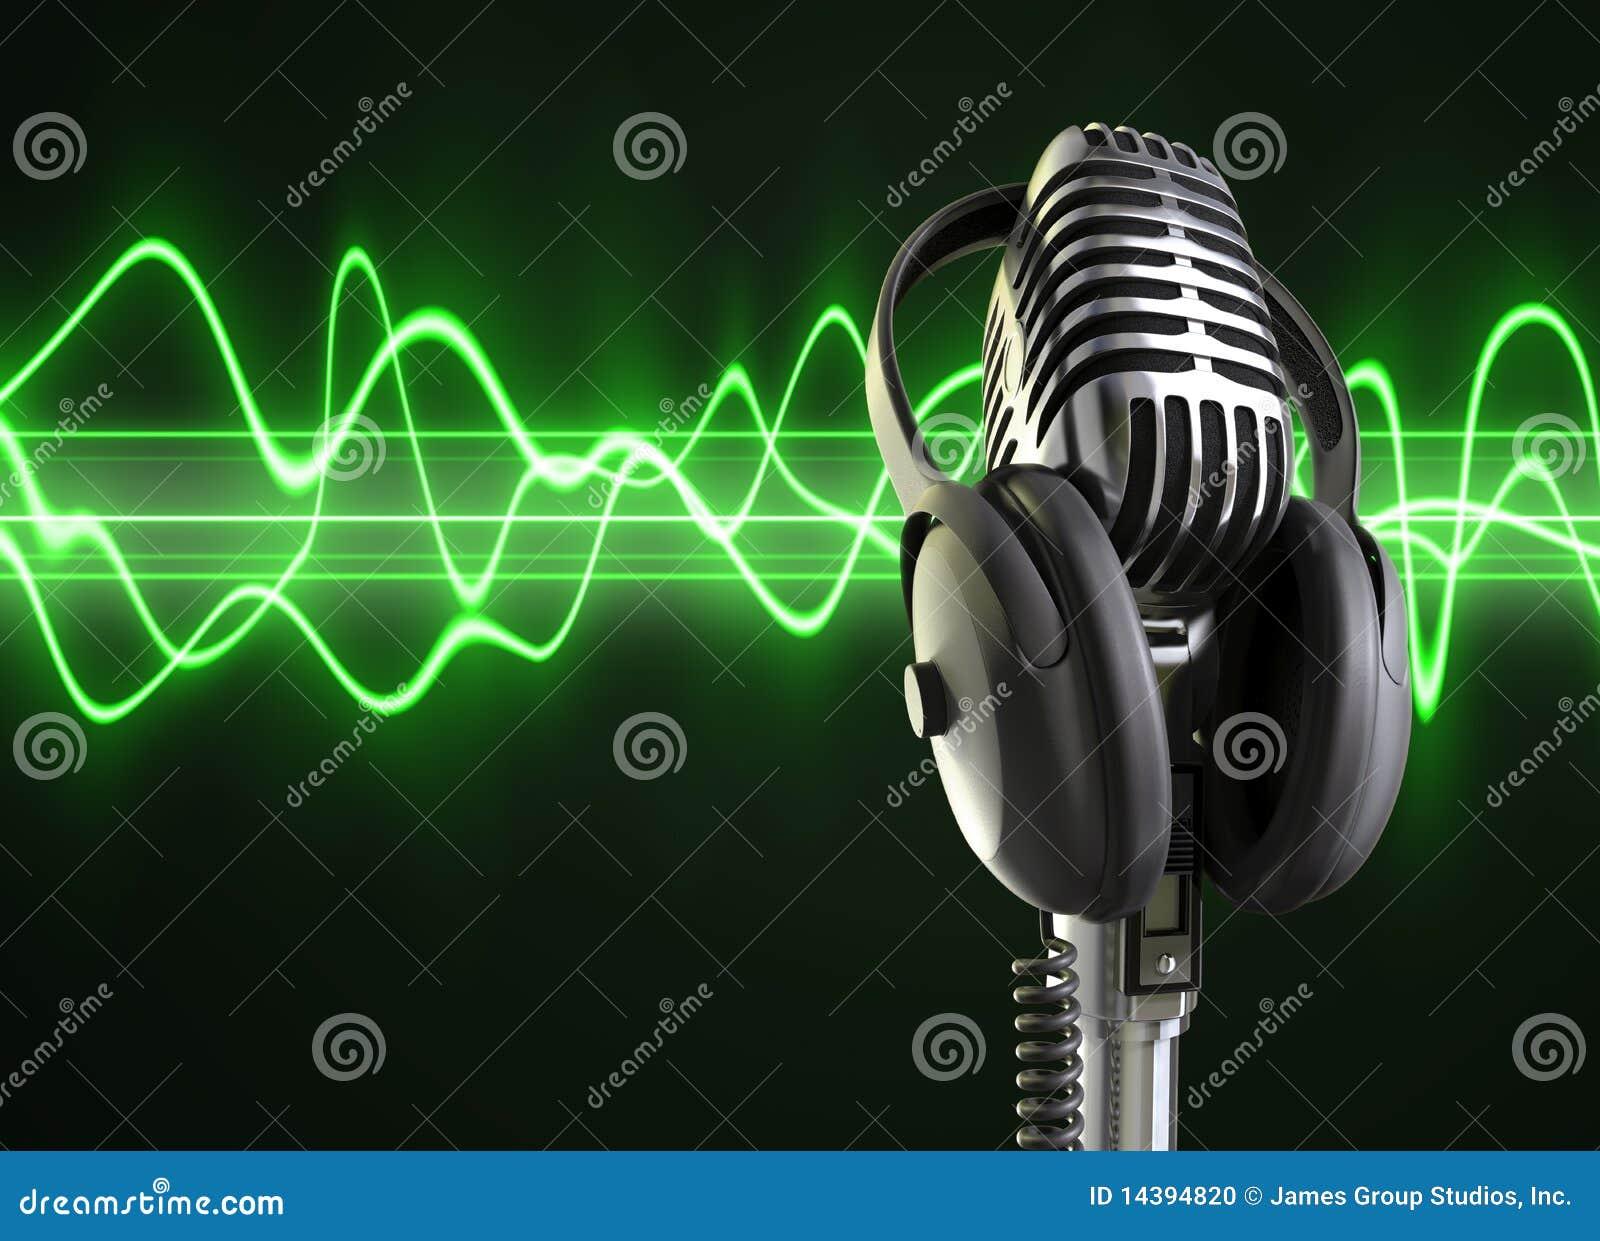 Audio Waves Amp Microphone Stock Photo Image 14394820